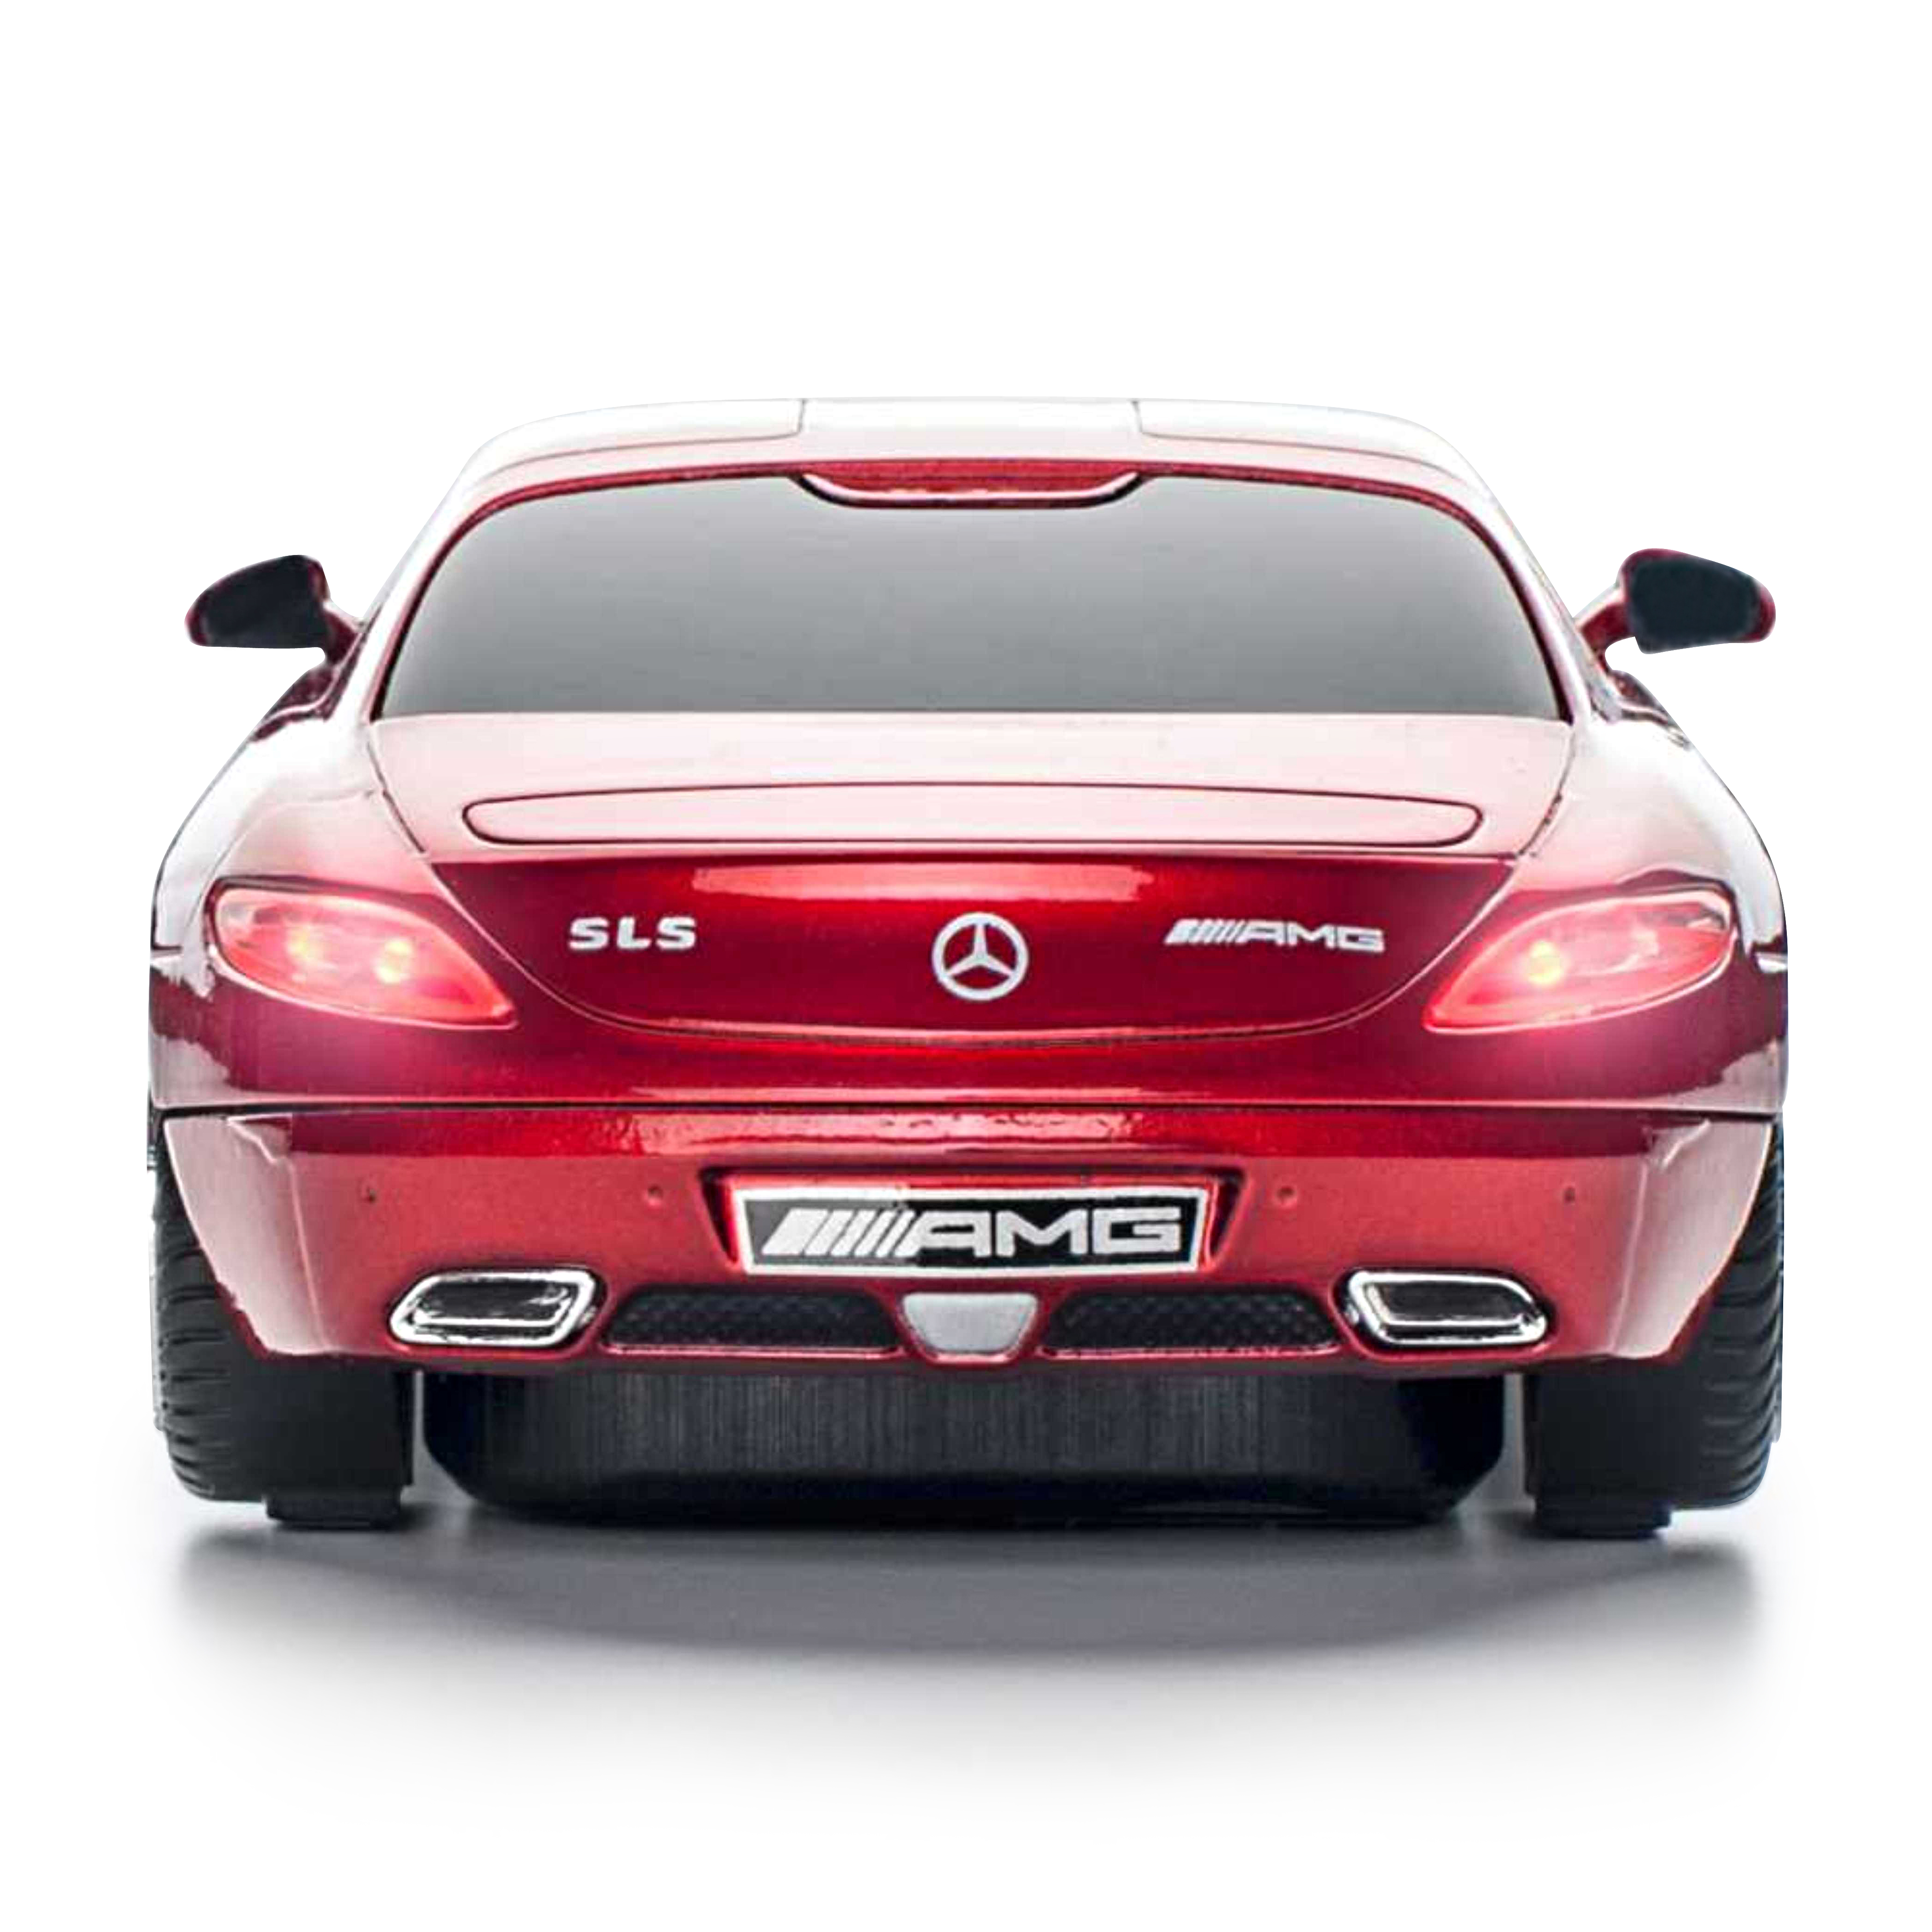 Official mercedes benz sls amg wireless computer mouse red for Mercedes benz sls amg red